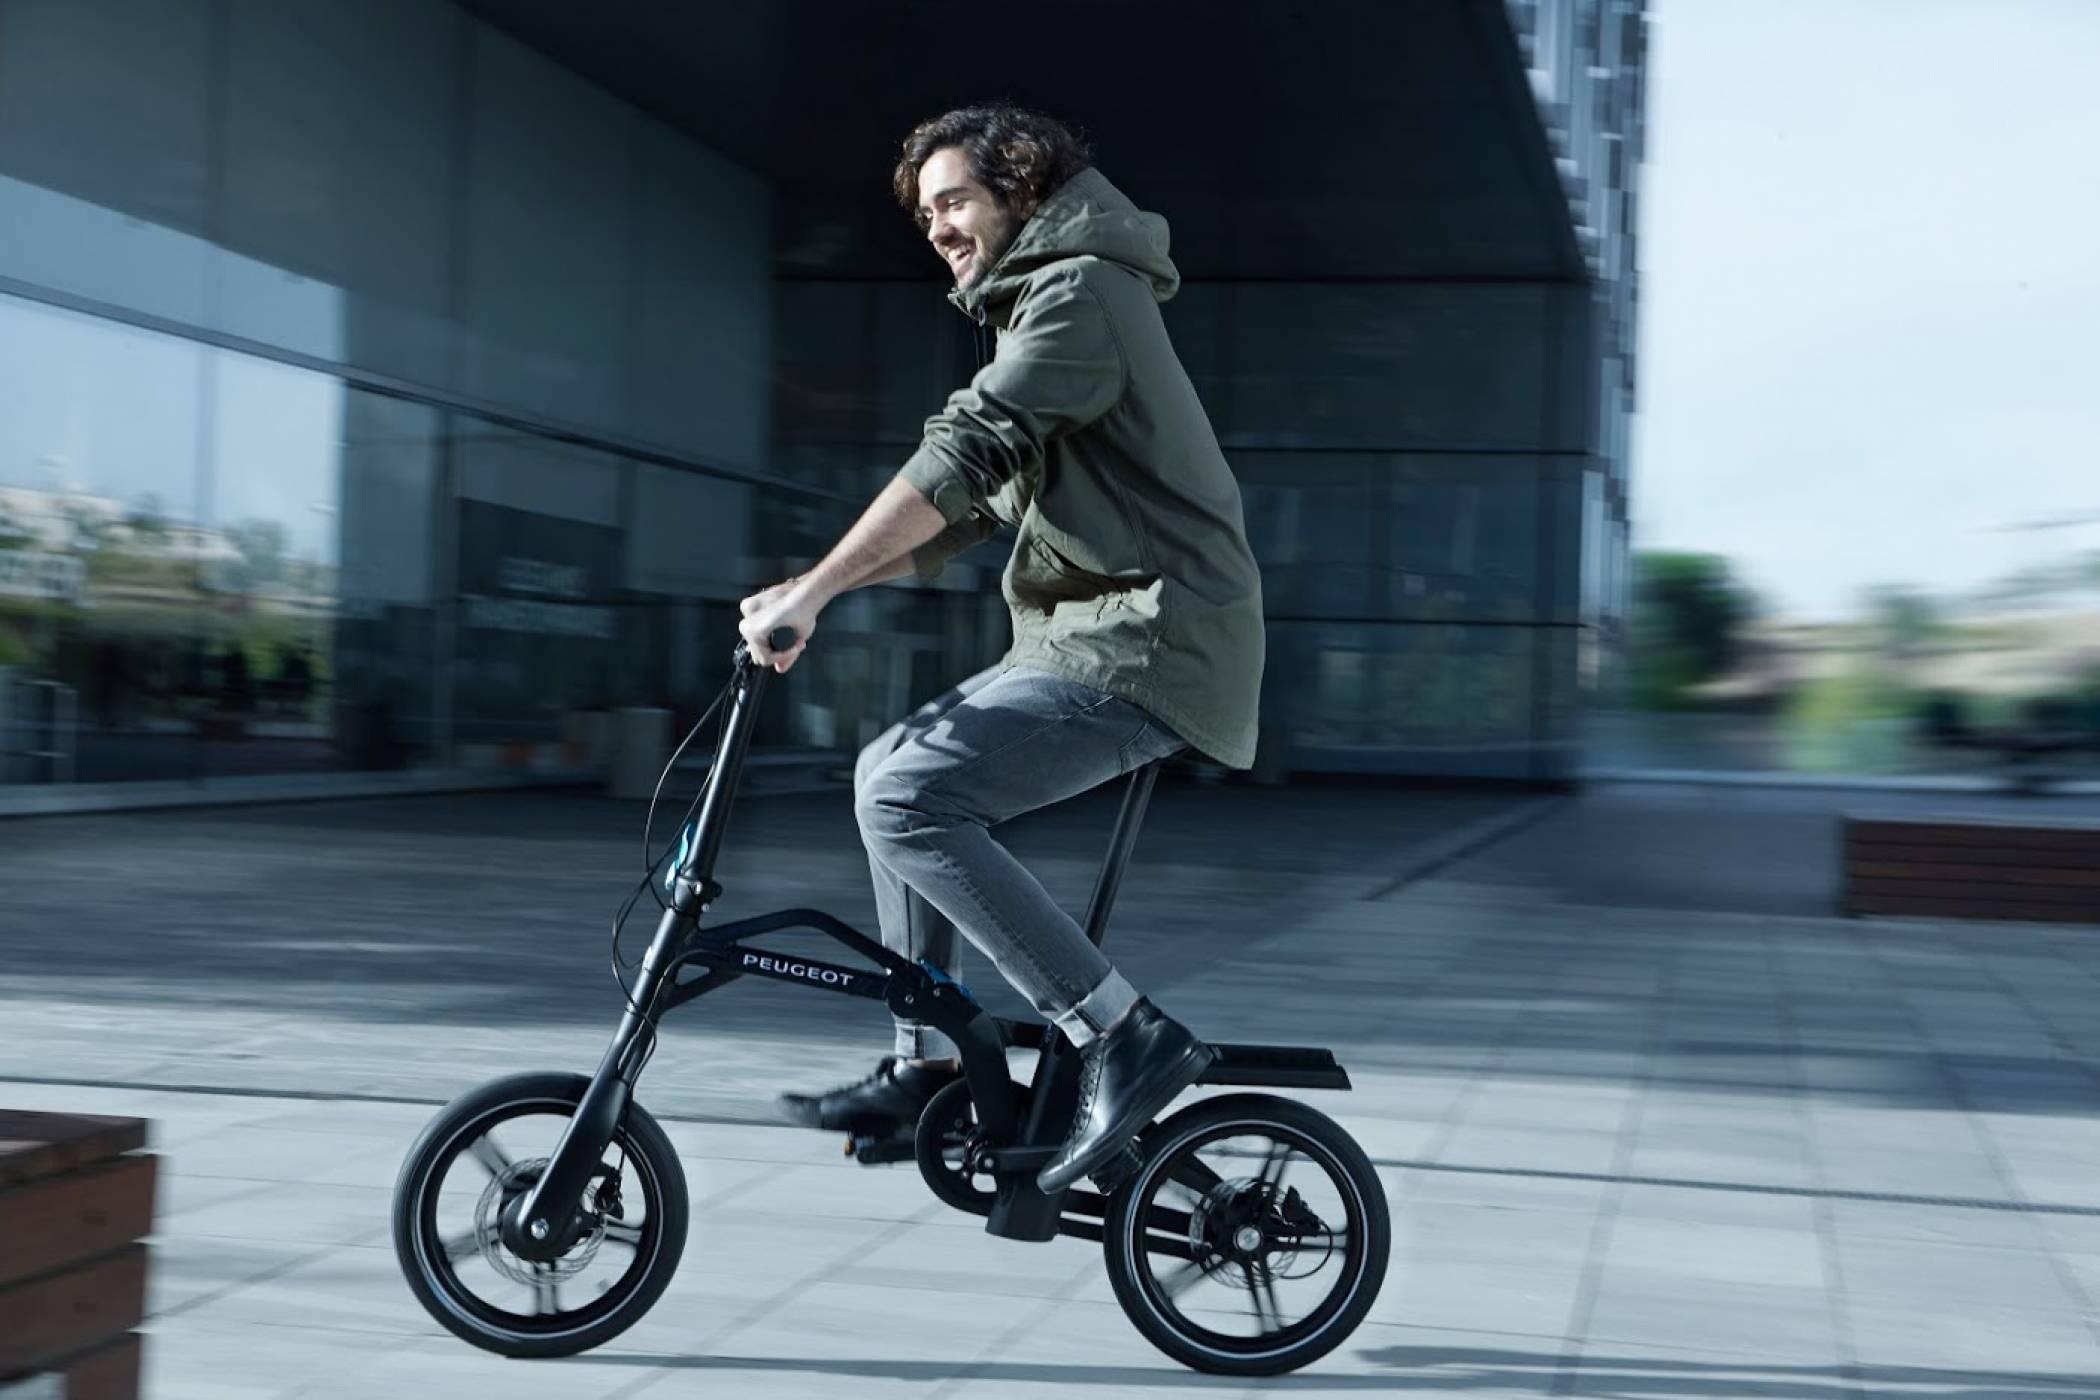 Велосипед, който вероятно ще пожелаеш (СНИМКИ)